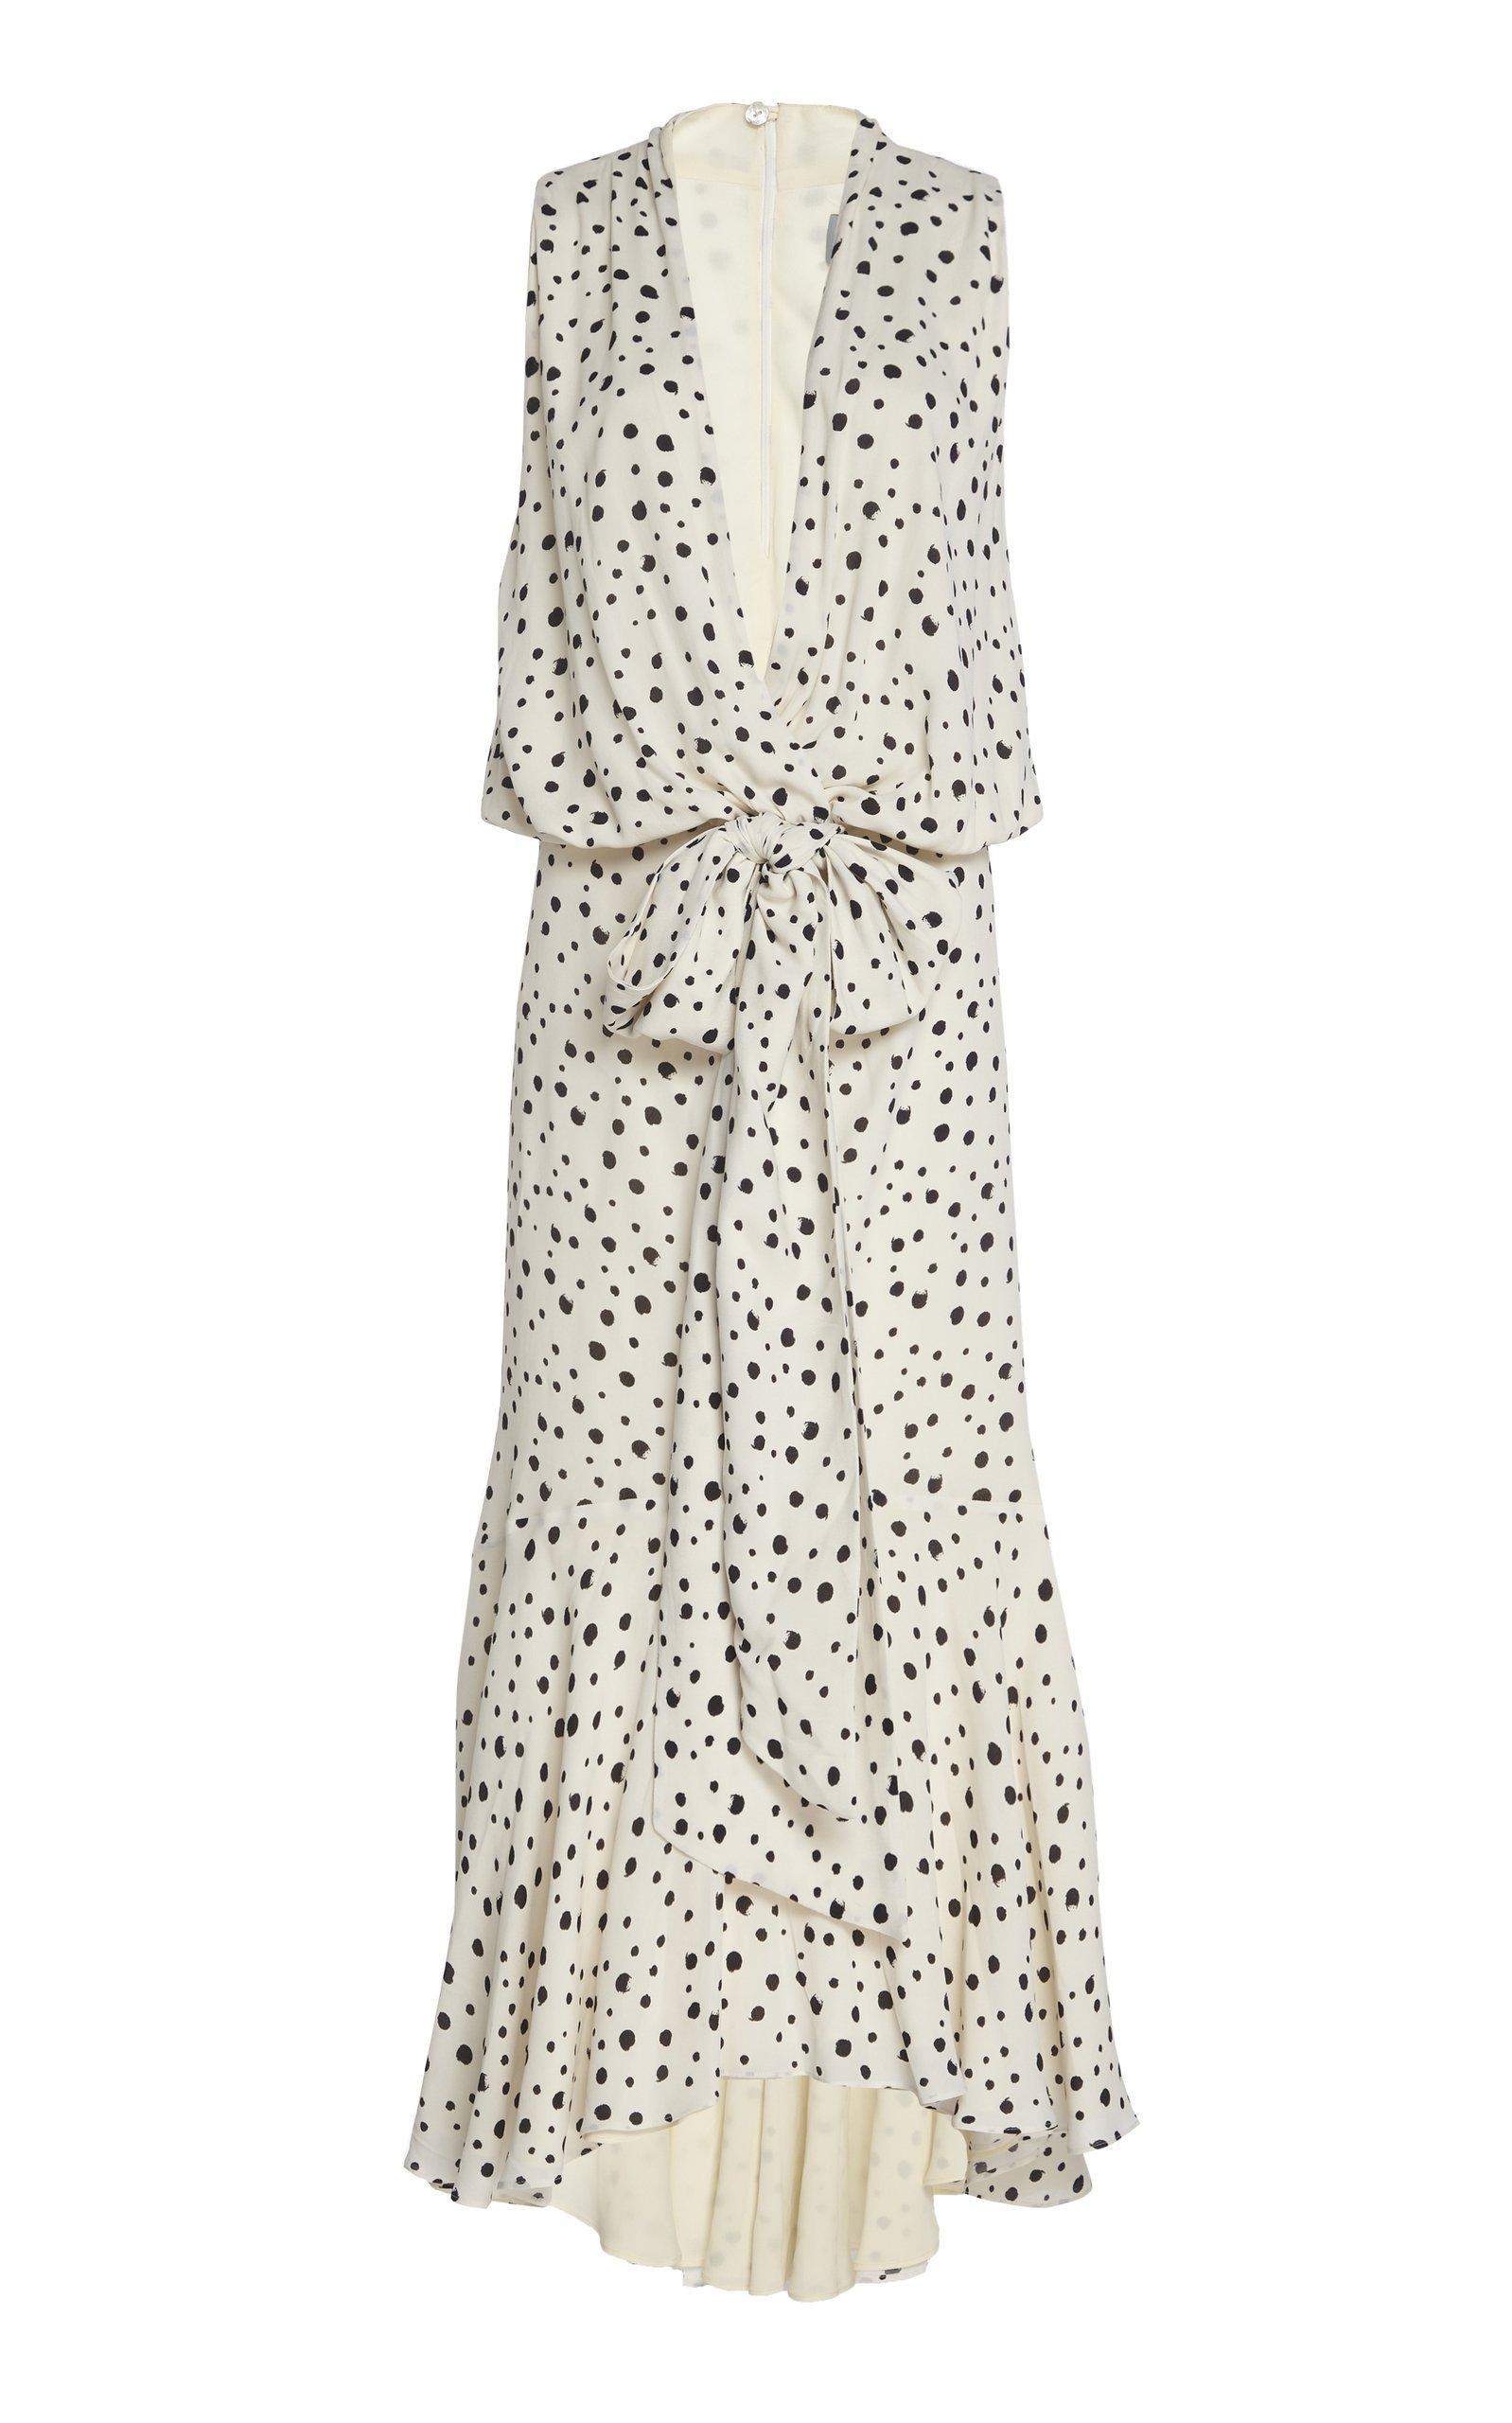 Silvia Tcherassi Nini Crepe De Chine Dress Size: M